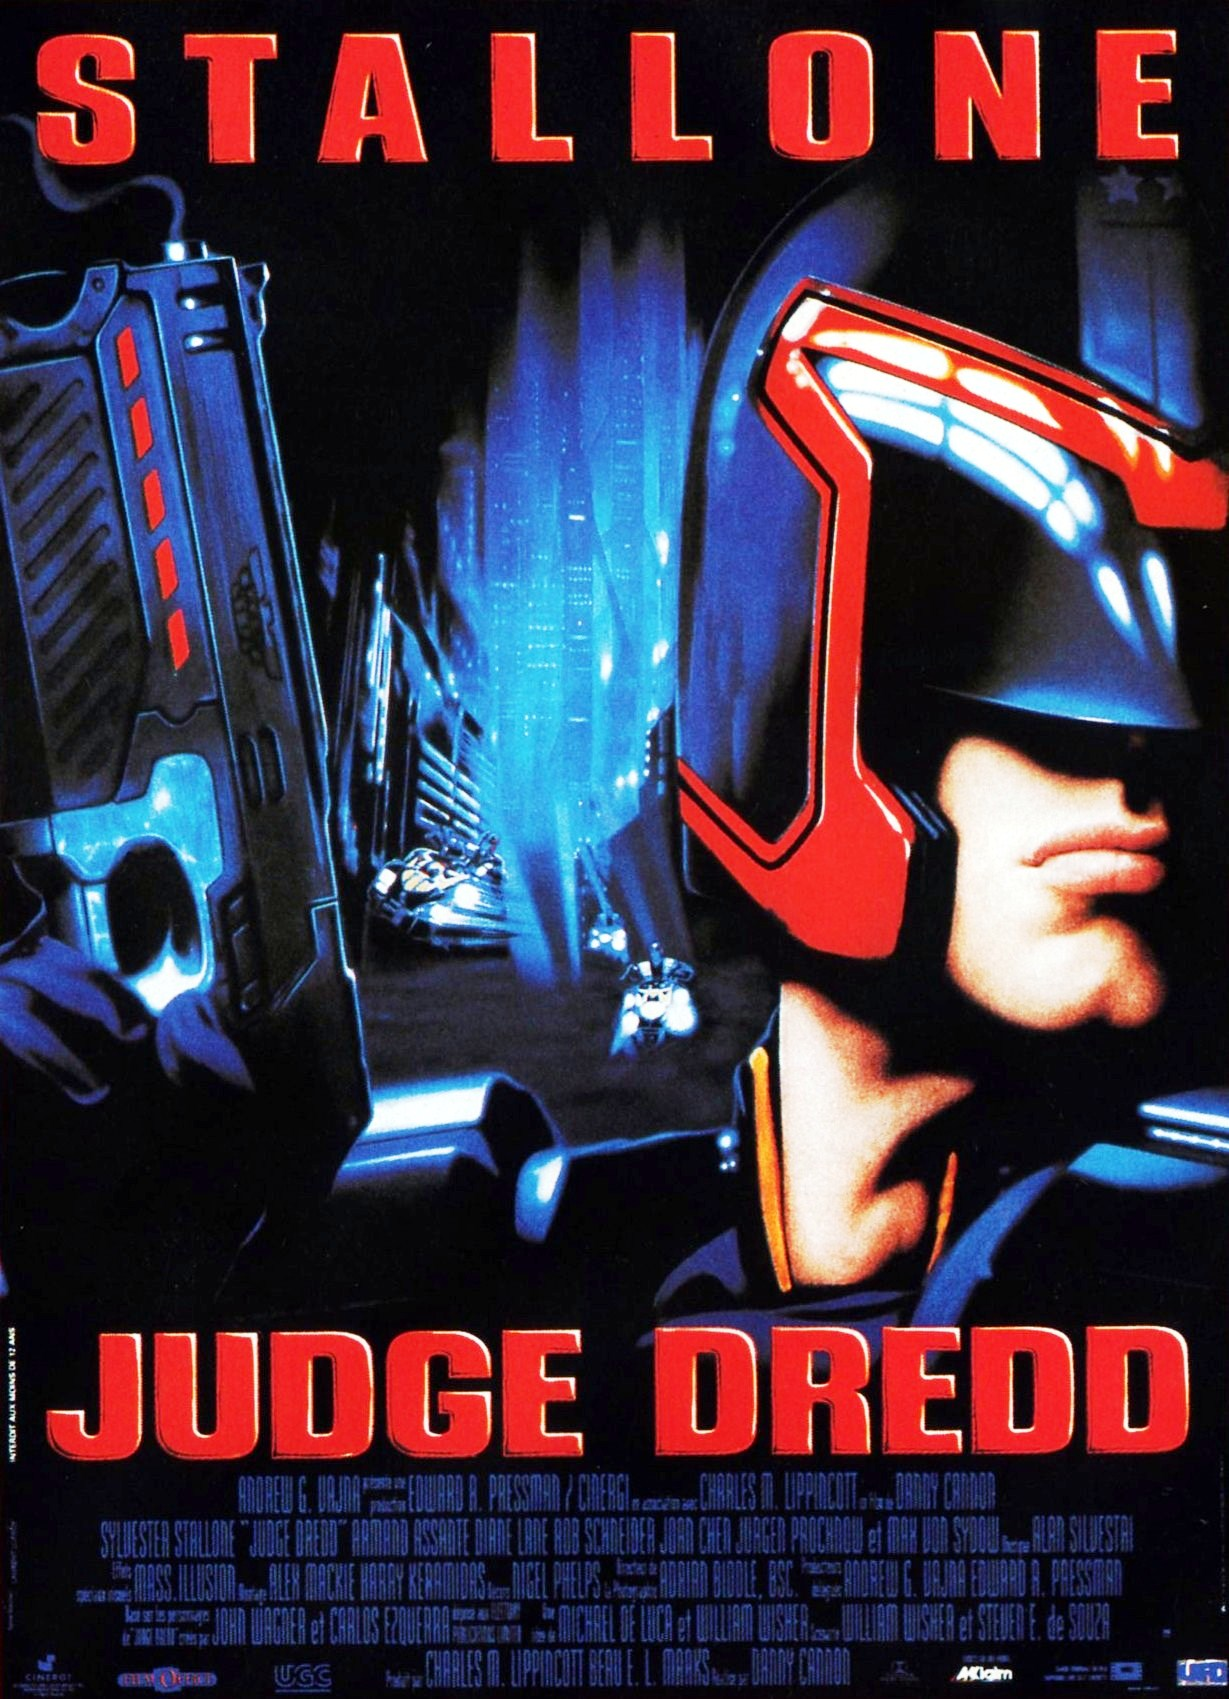 Judge Dredd 1995 poster